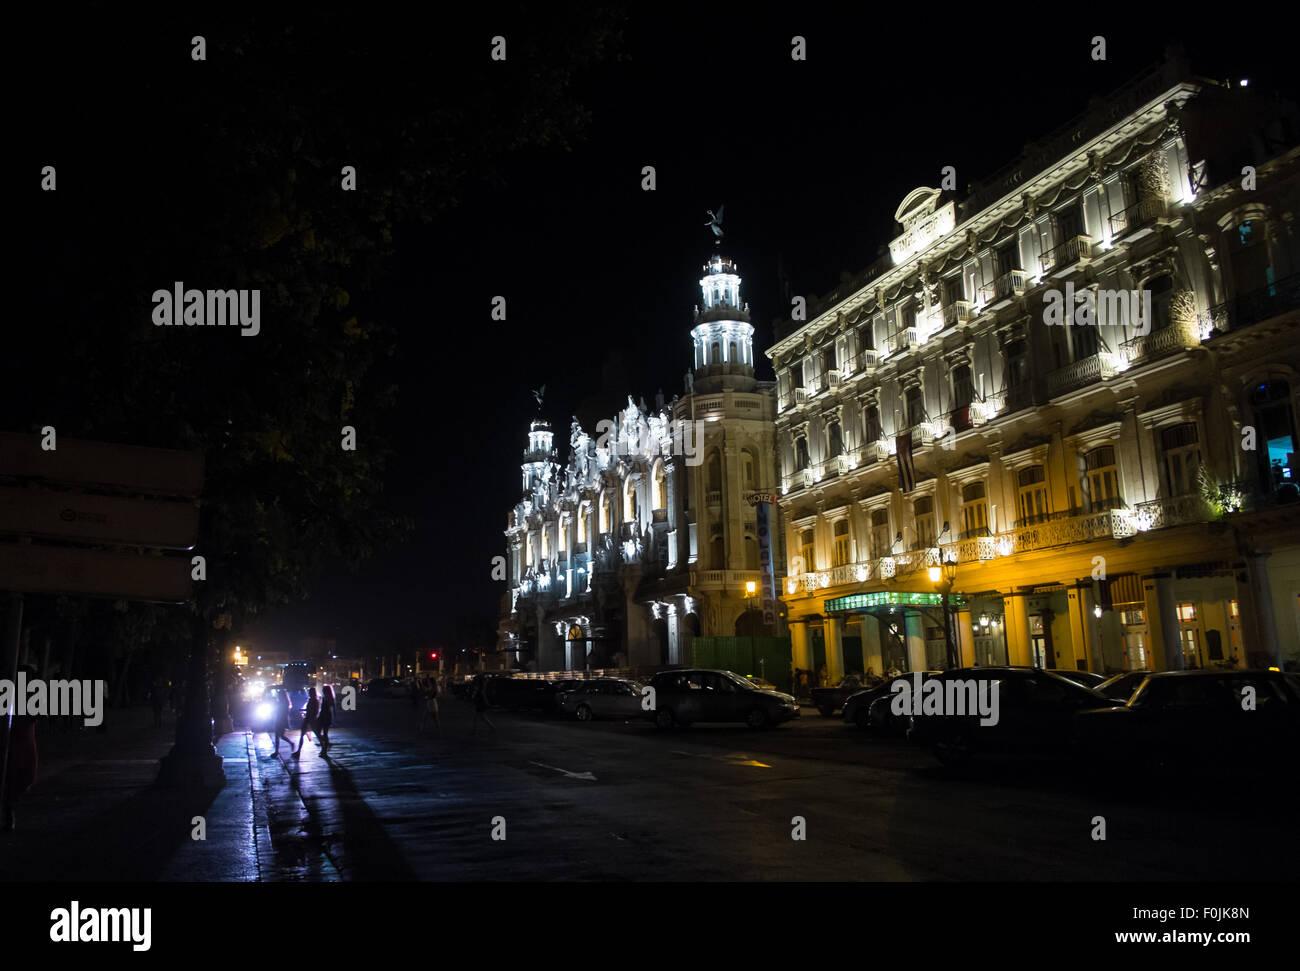 Havana, Cuba's Hotel Inglaterra and Gran Teatro de Habana at night. - Stock Image